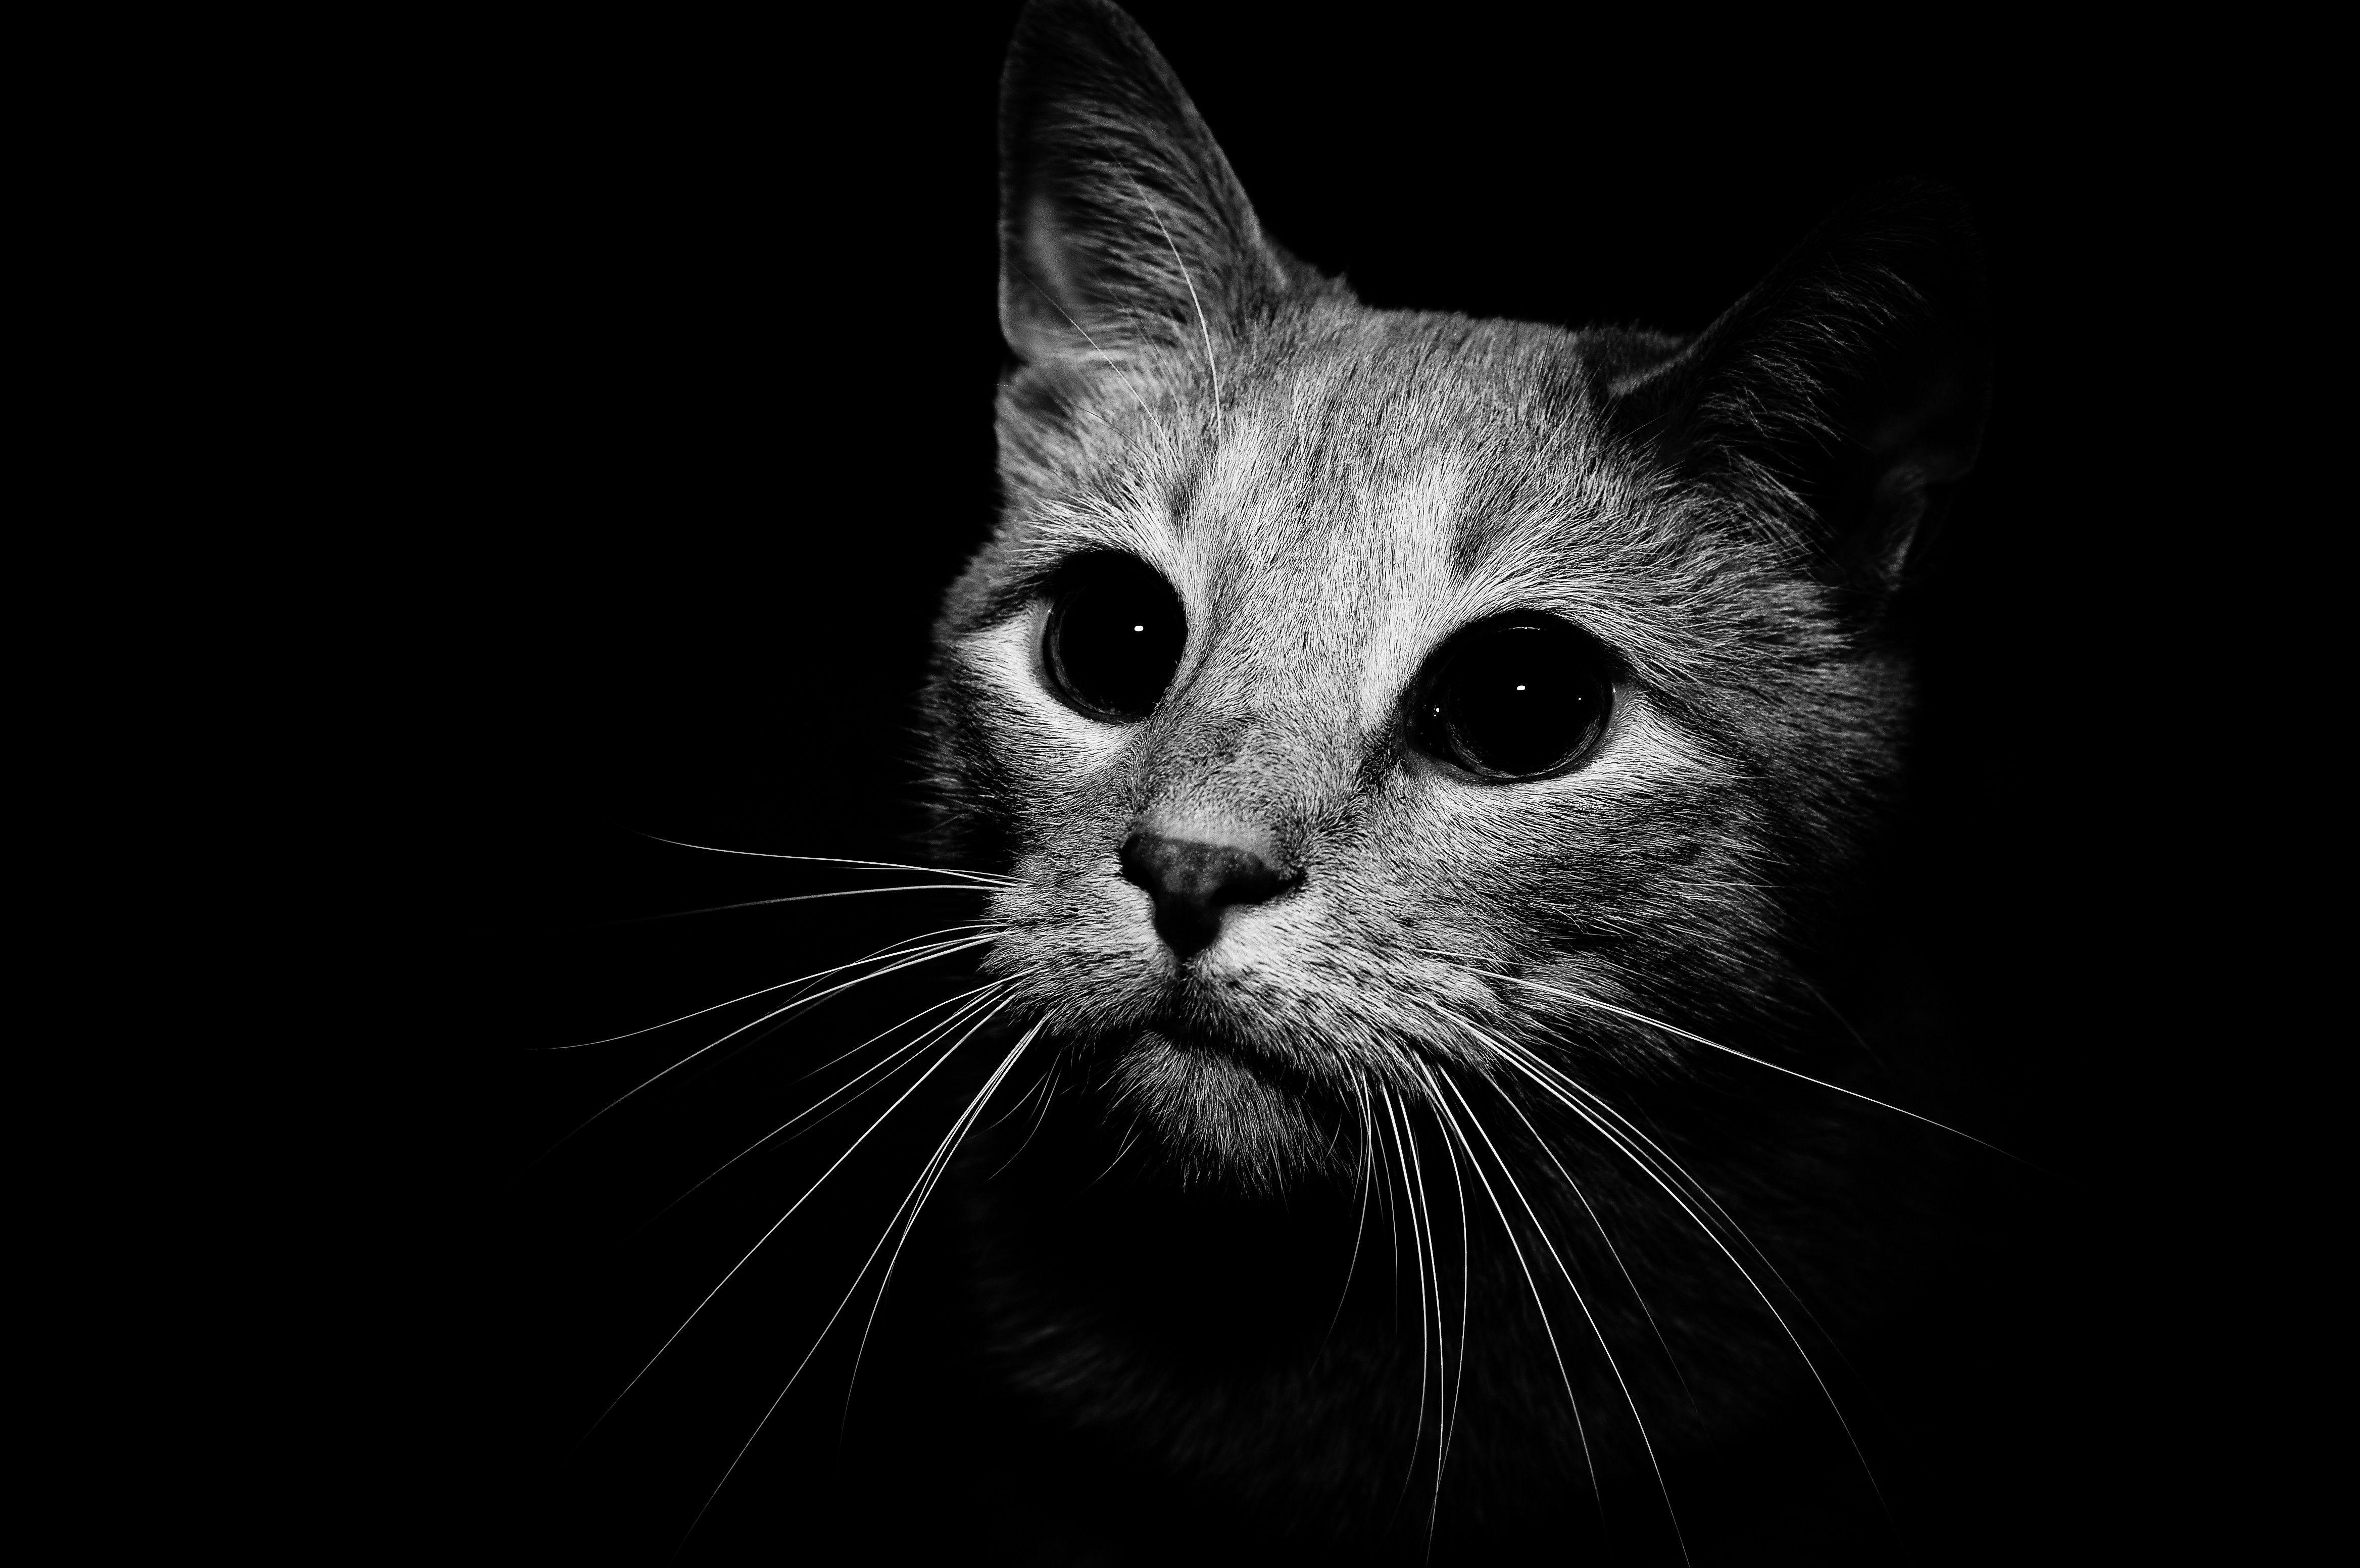 Black White Wallpapers Cats Pet Birds Cat Wallpaper